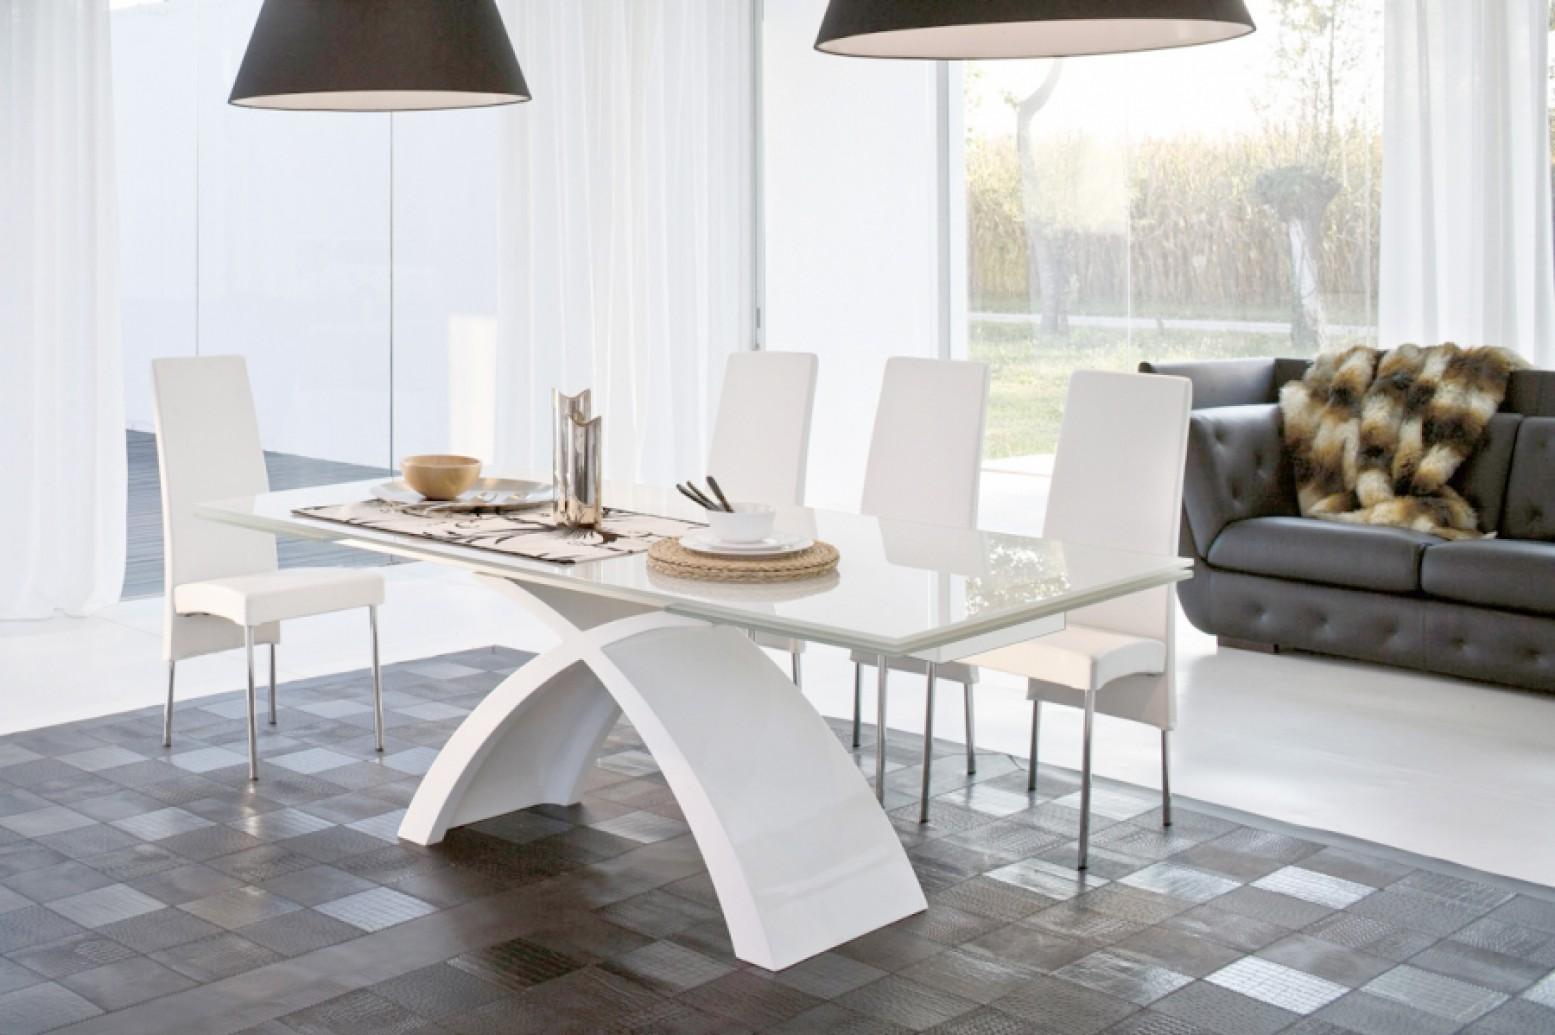 tokyo extendable dining table glossy white base matt white aluminum rails extra clear white glass top